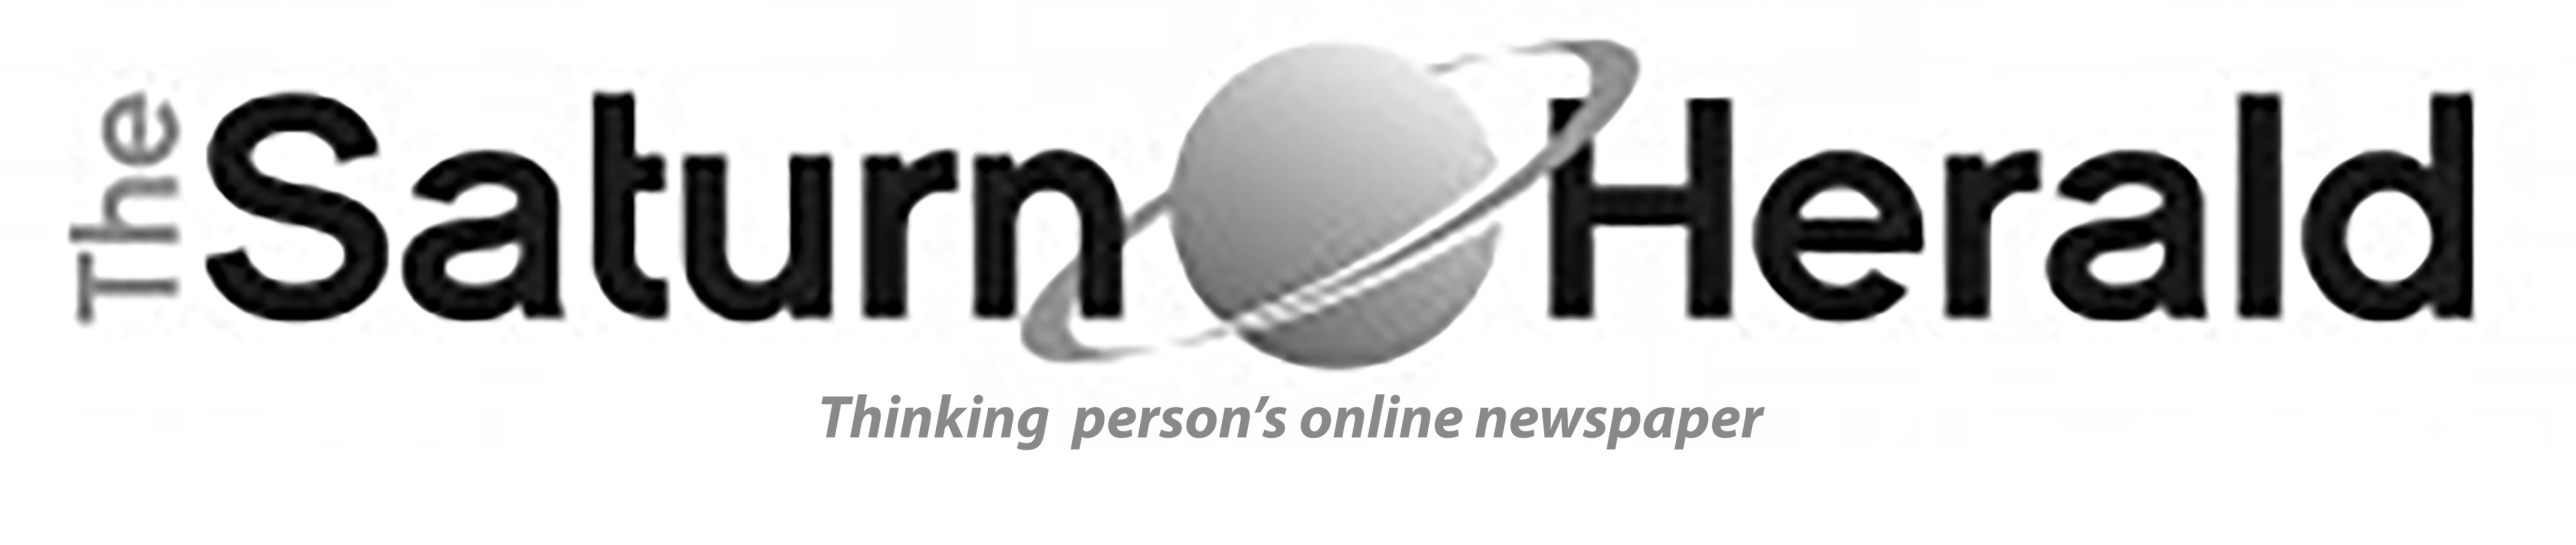 The Saturn Herald